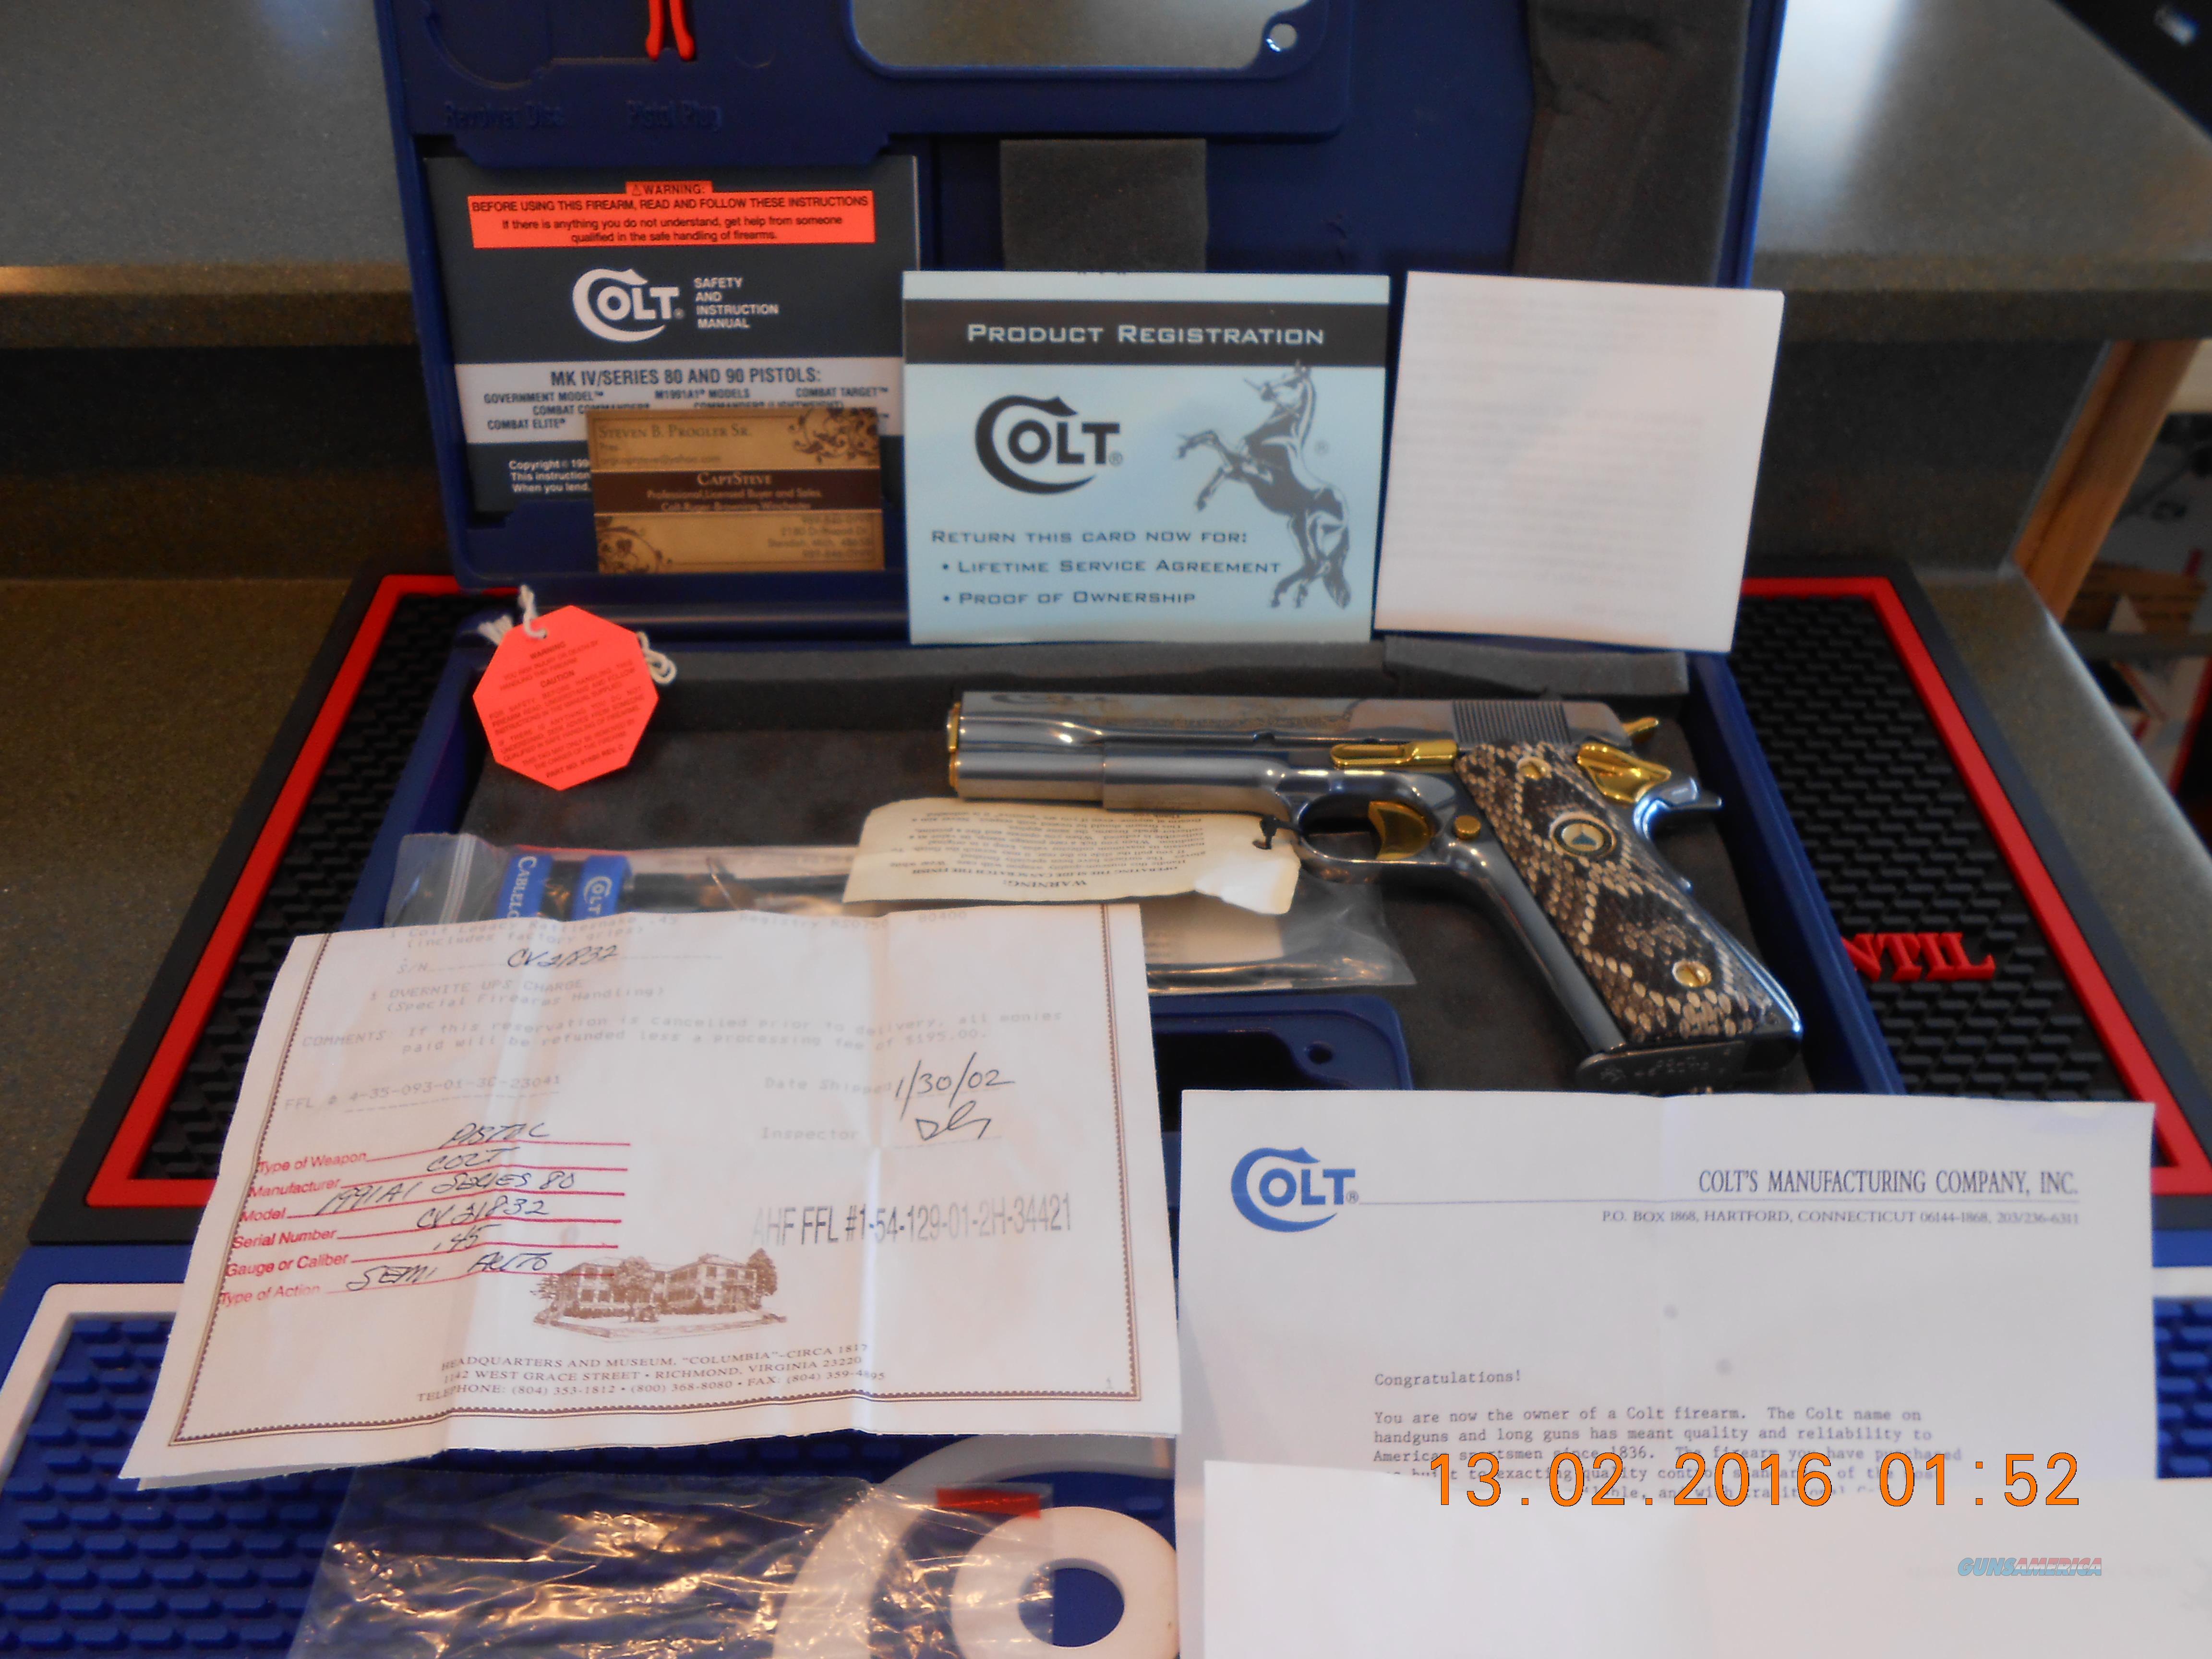 Colt RattleSnake Legacy Titanium  Guns > Pistols > Colt Commemorative Pistols